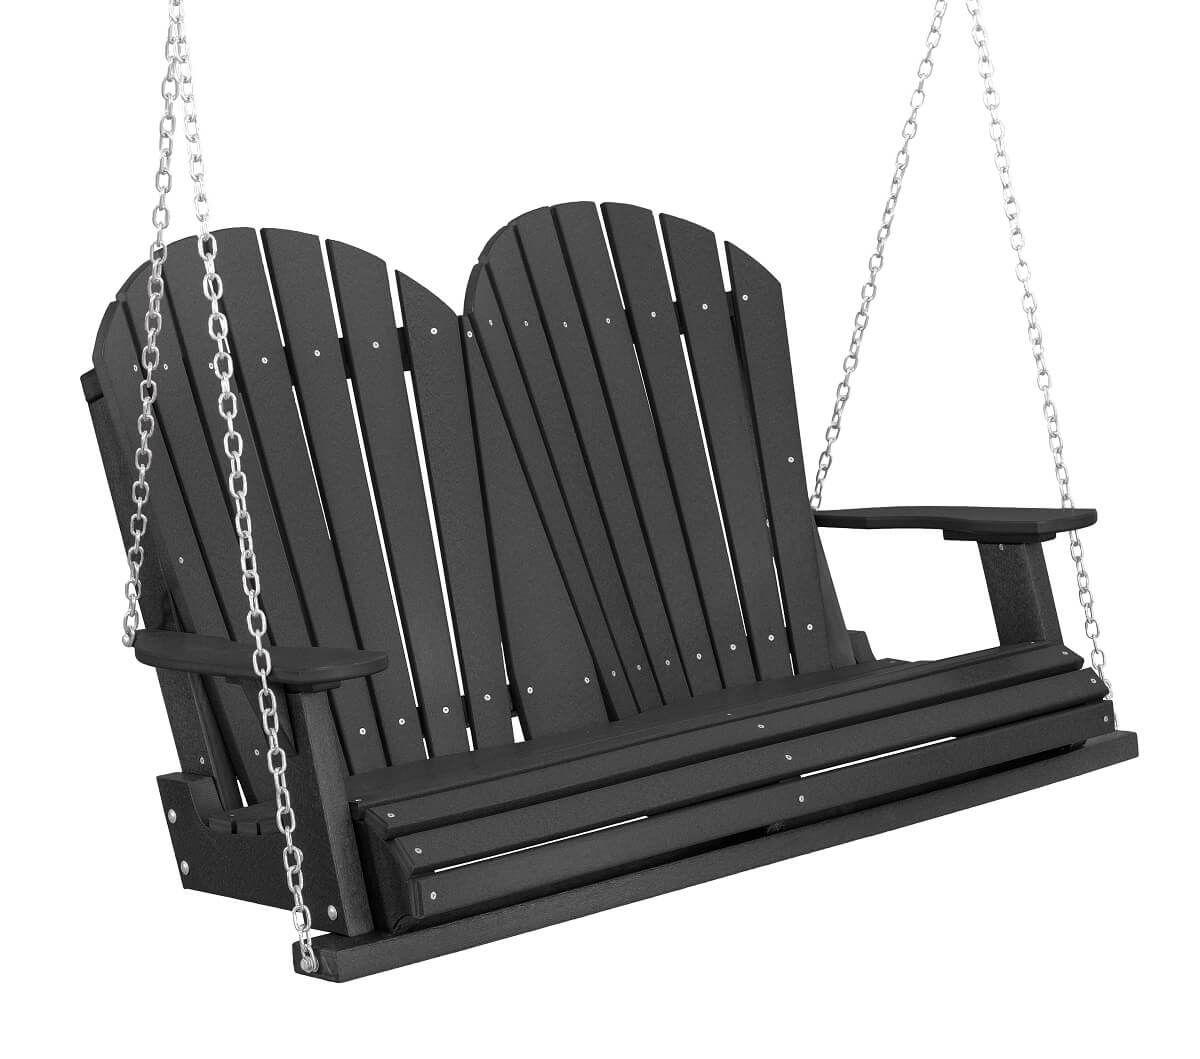 Black Sidra Outdoor Porch Swing